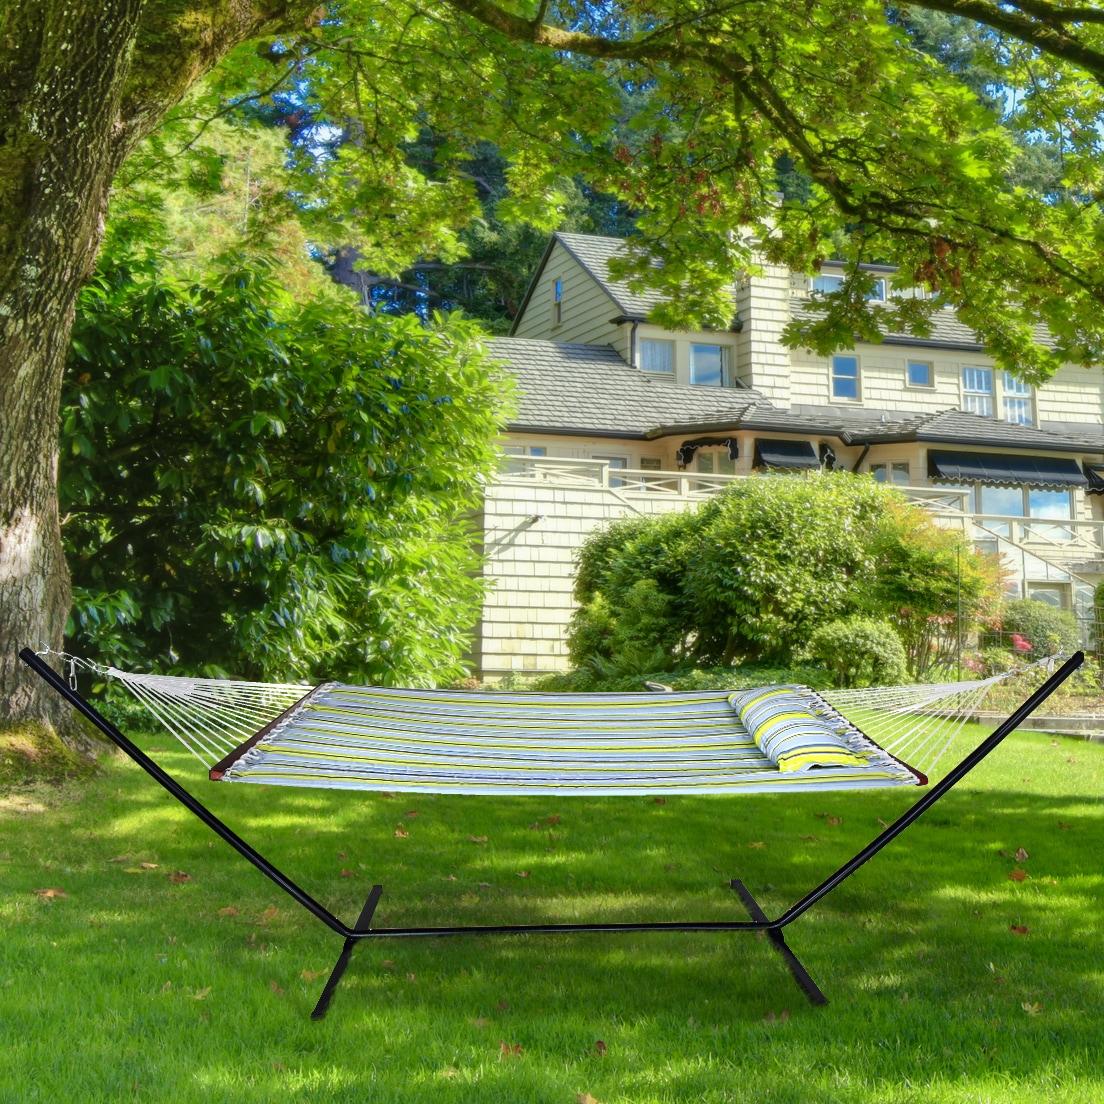 Sorbus® Hammock Bed Includes Detachable Pillow and Spreader Bar (Green Blue) (Sorbus Hammock Bed)